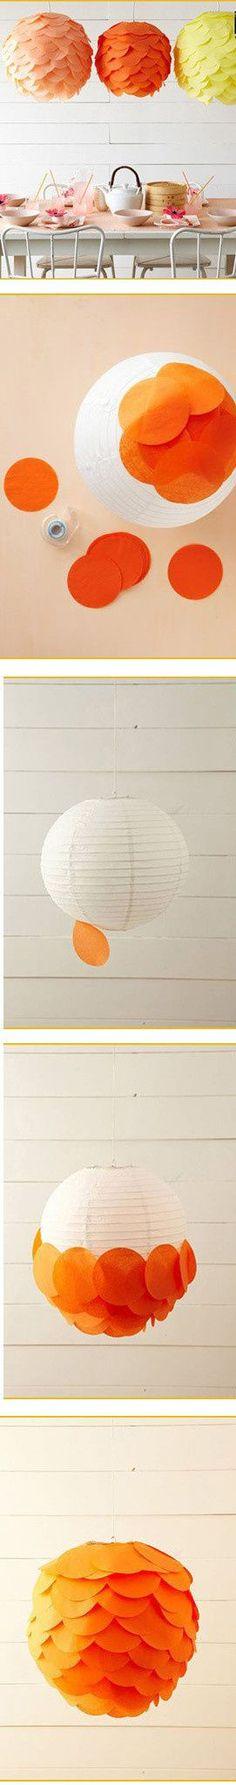 DIY Decorated Lantern DIY Projects